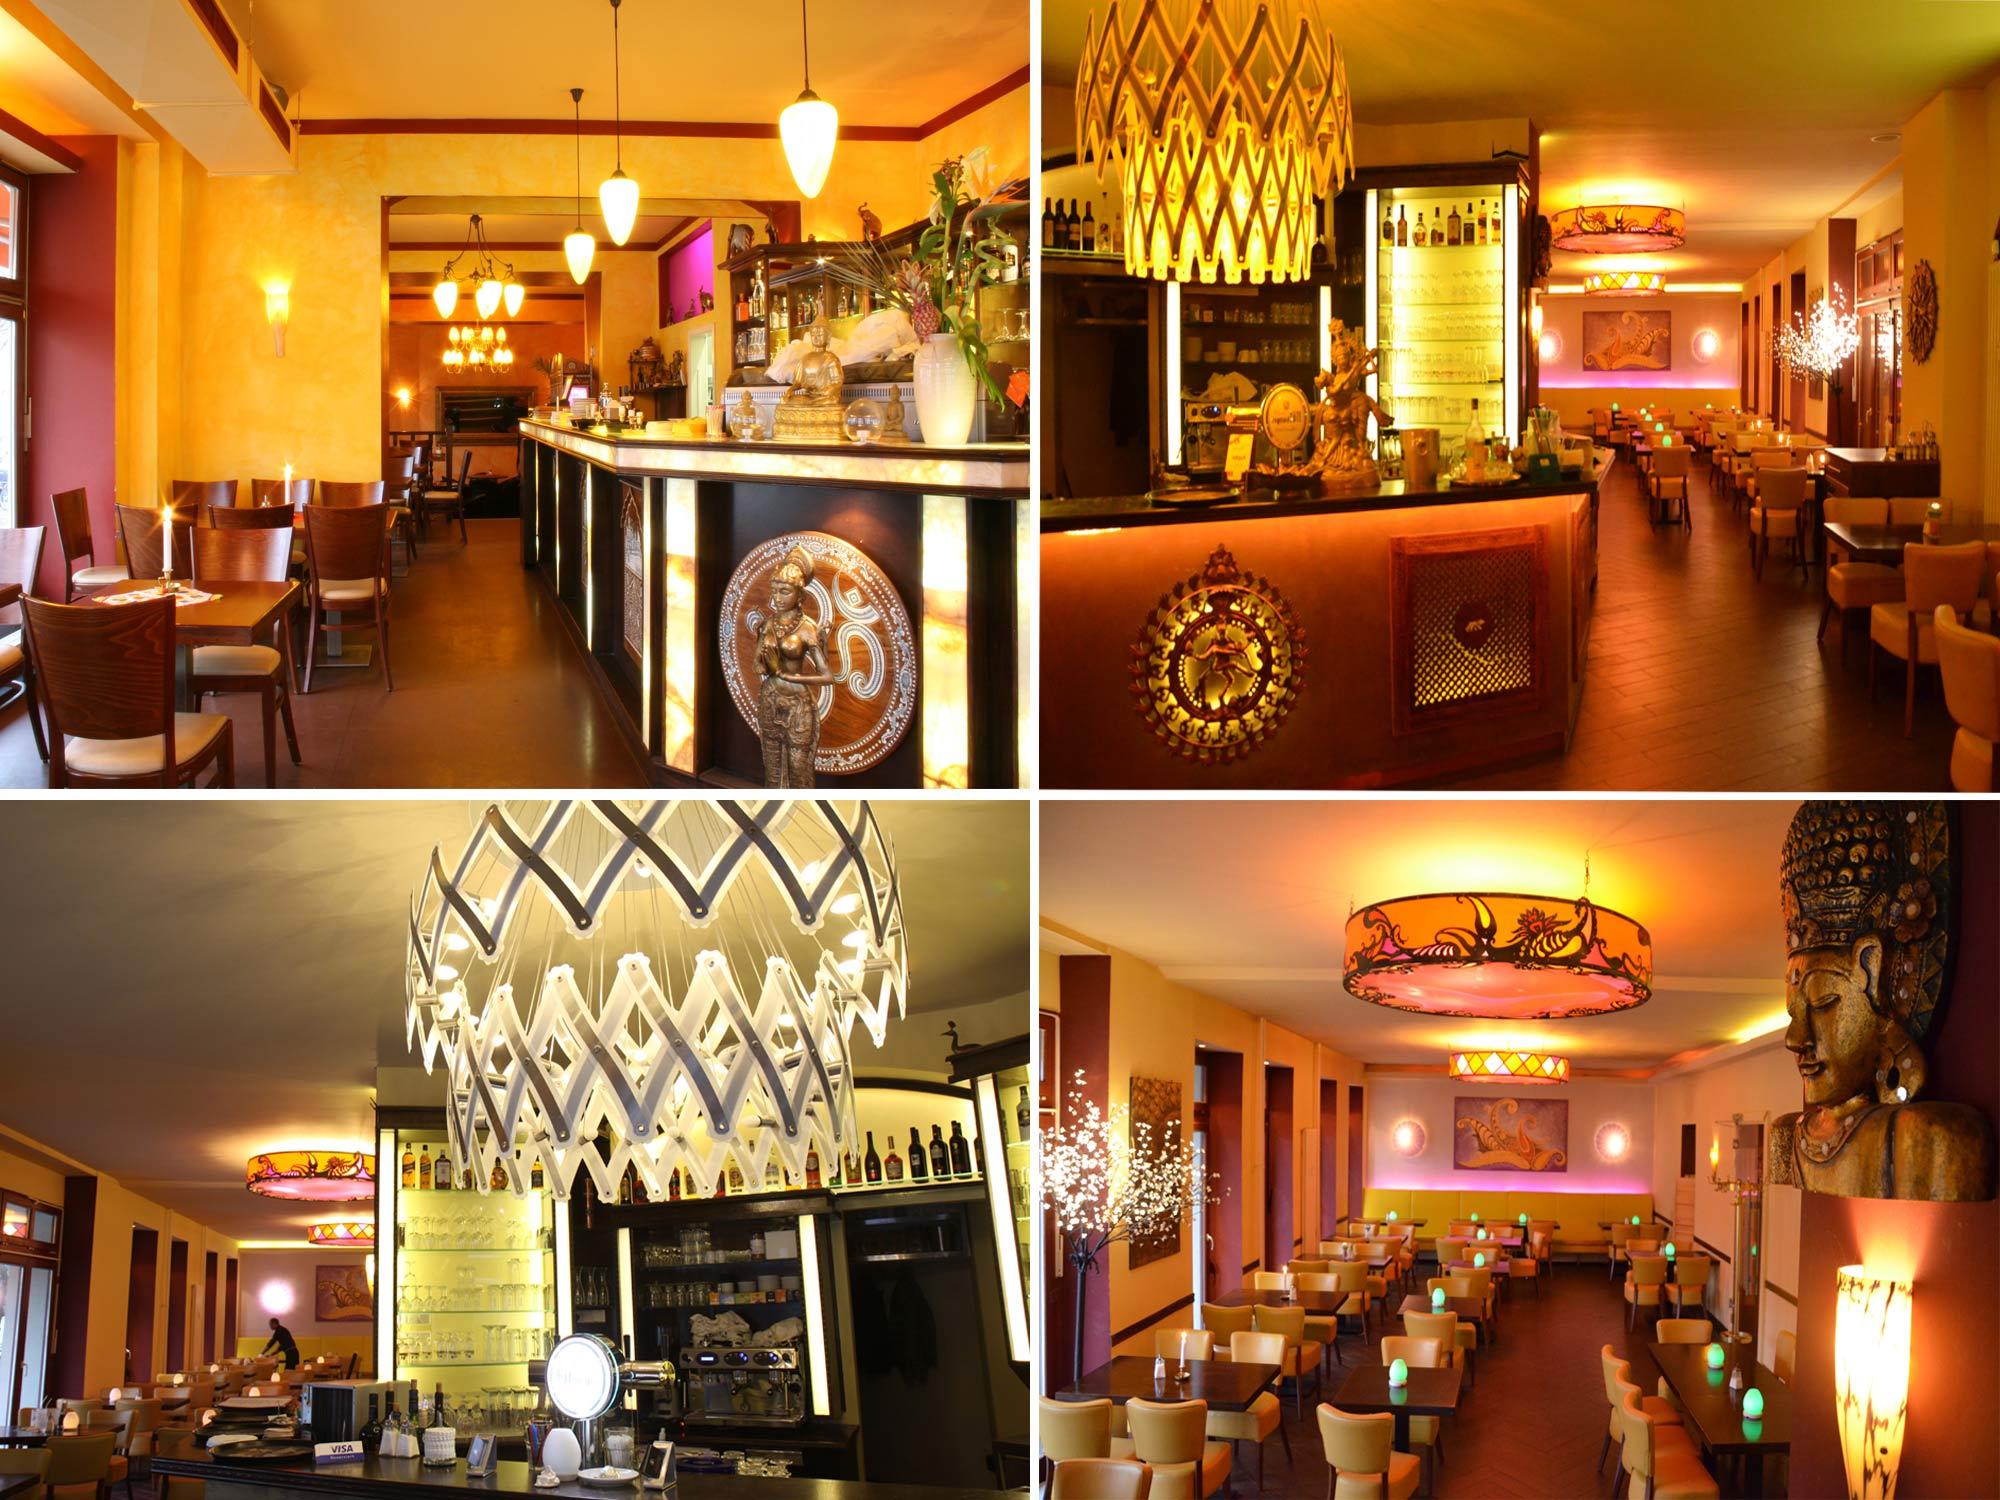 Indian Restaurant Aapka Indisches Restaurant Berlin